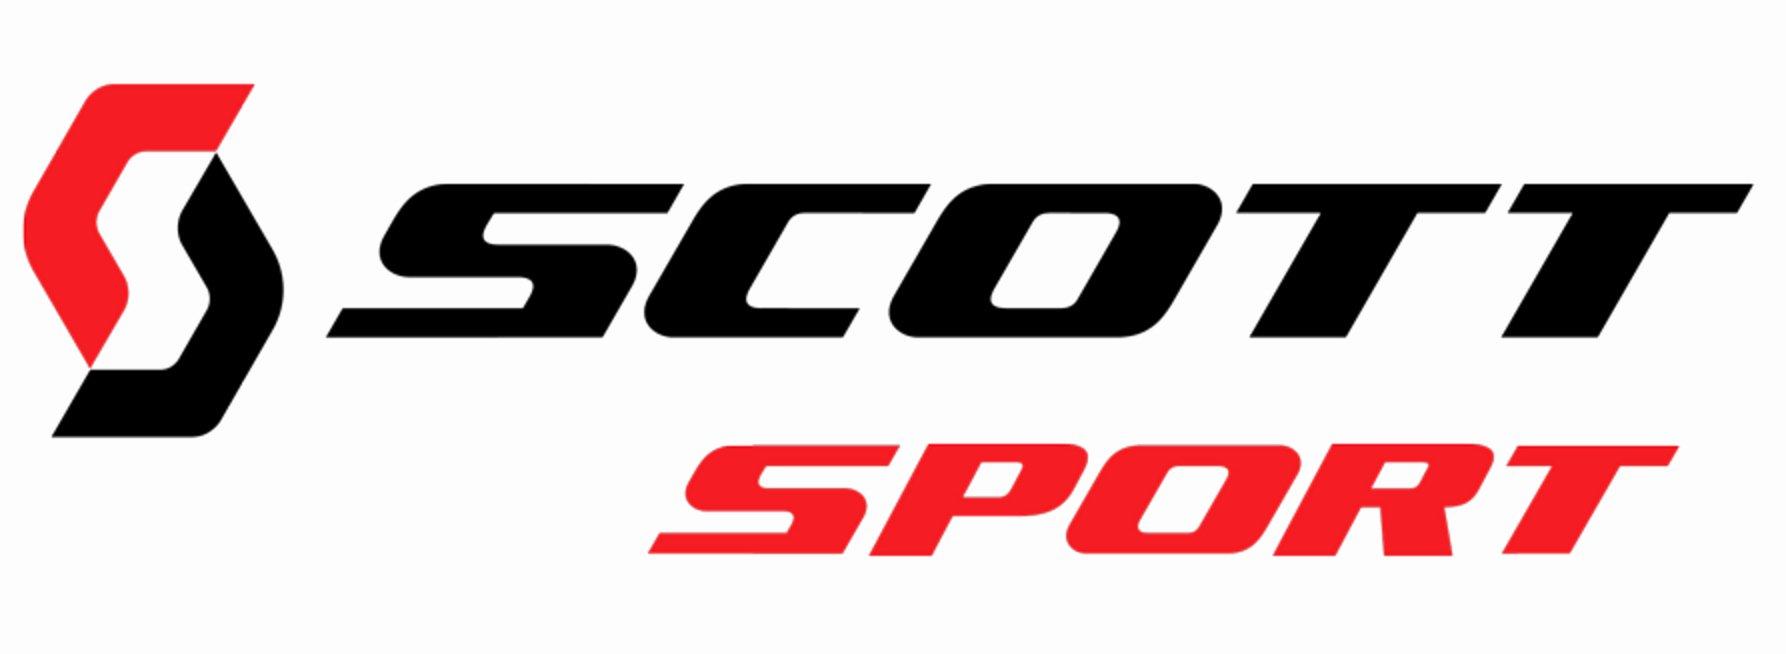 Scott sport